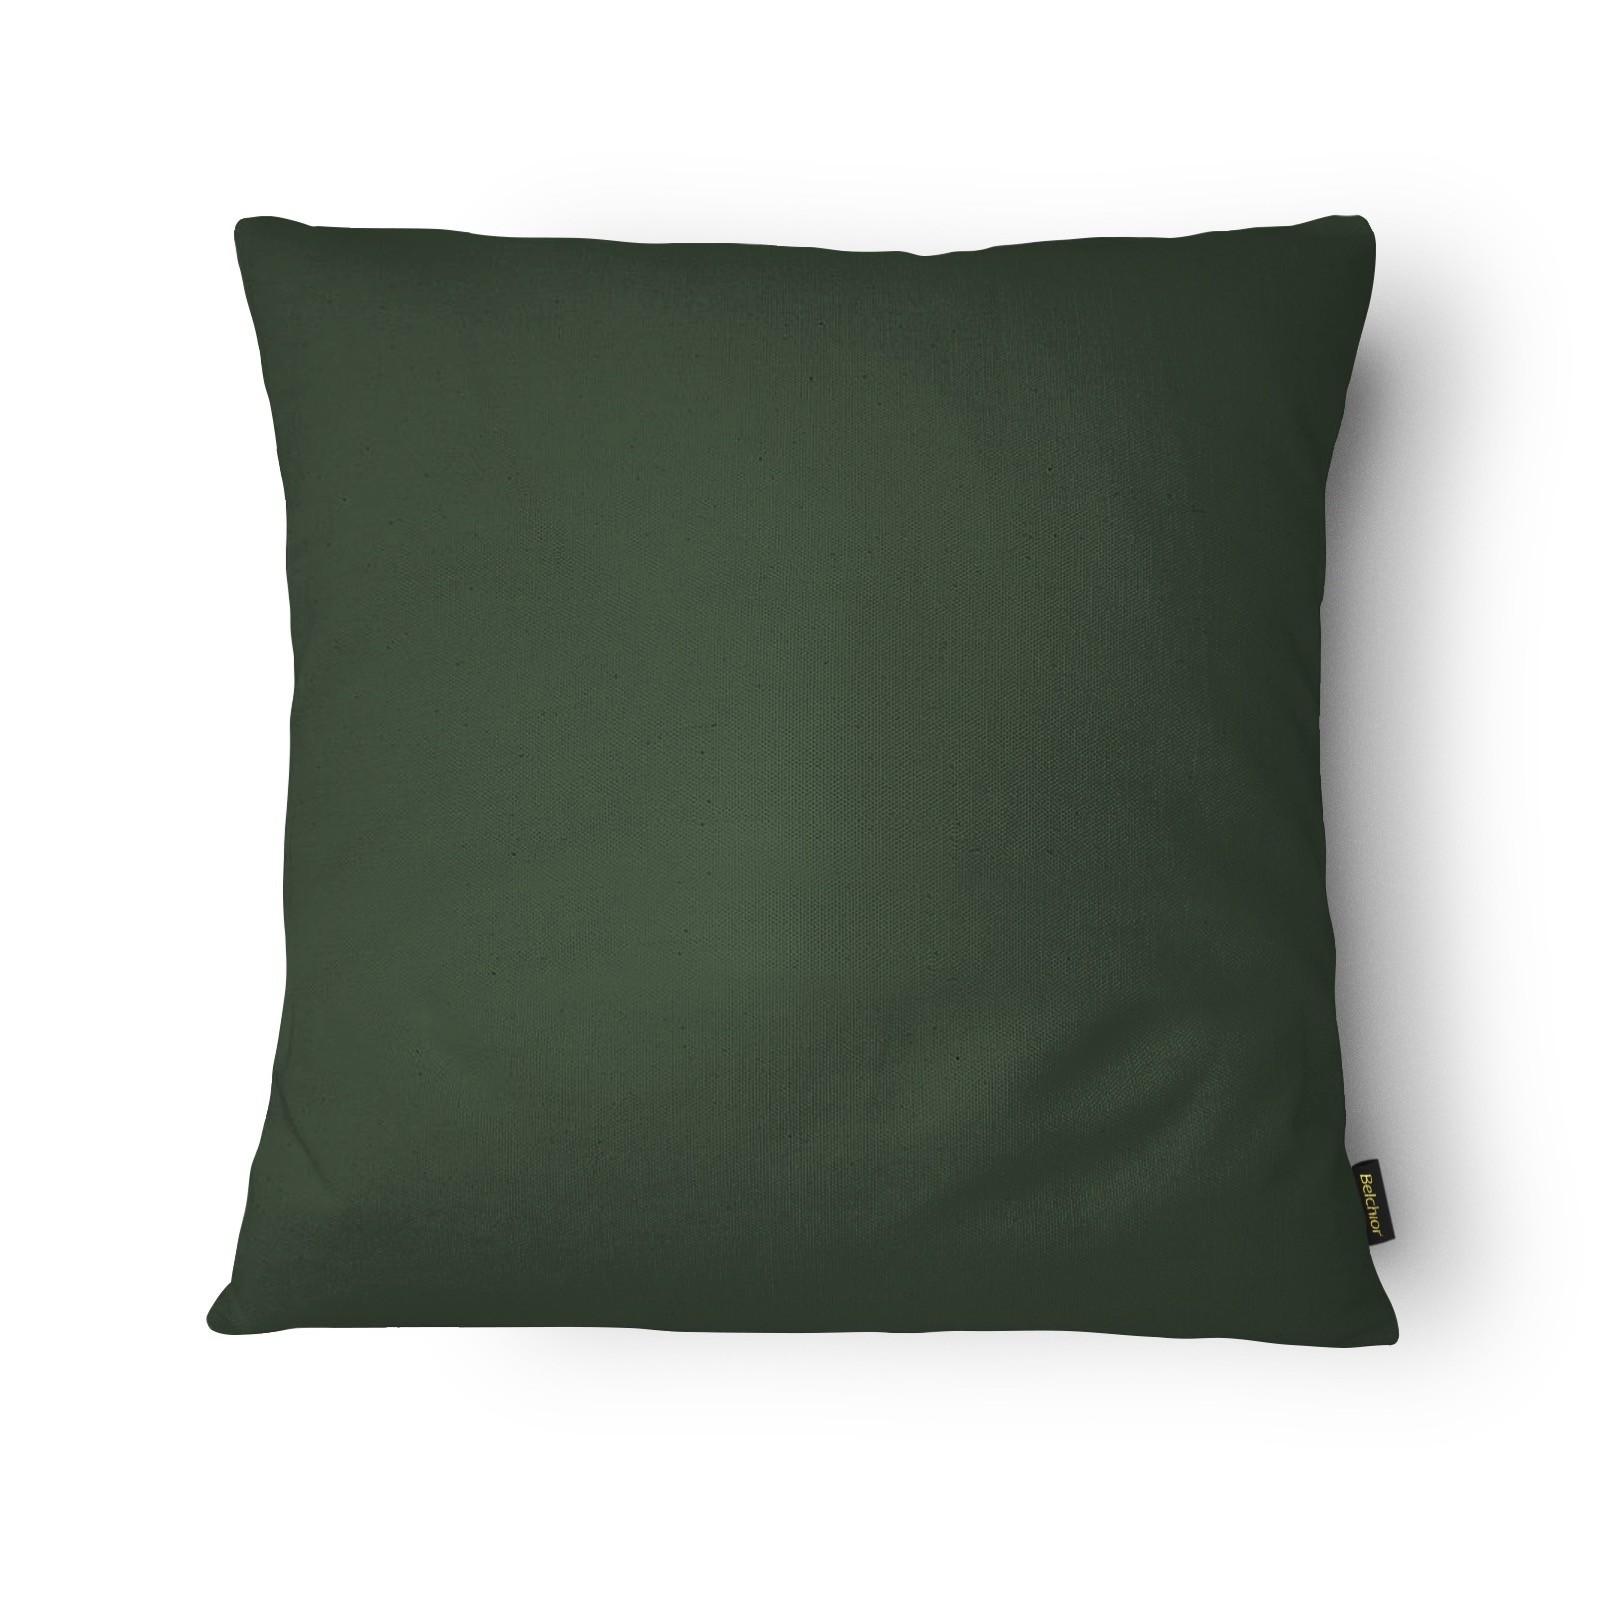 Capa de Almofada Colors 43x43 cm Verde Escuro 367098 - Belchior